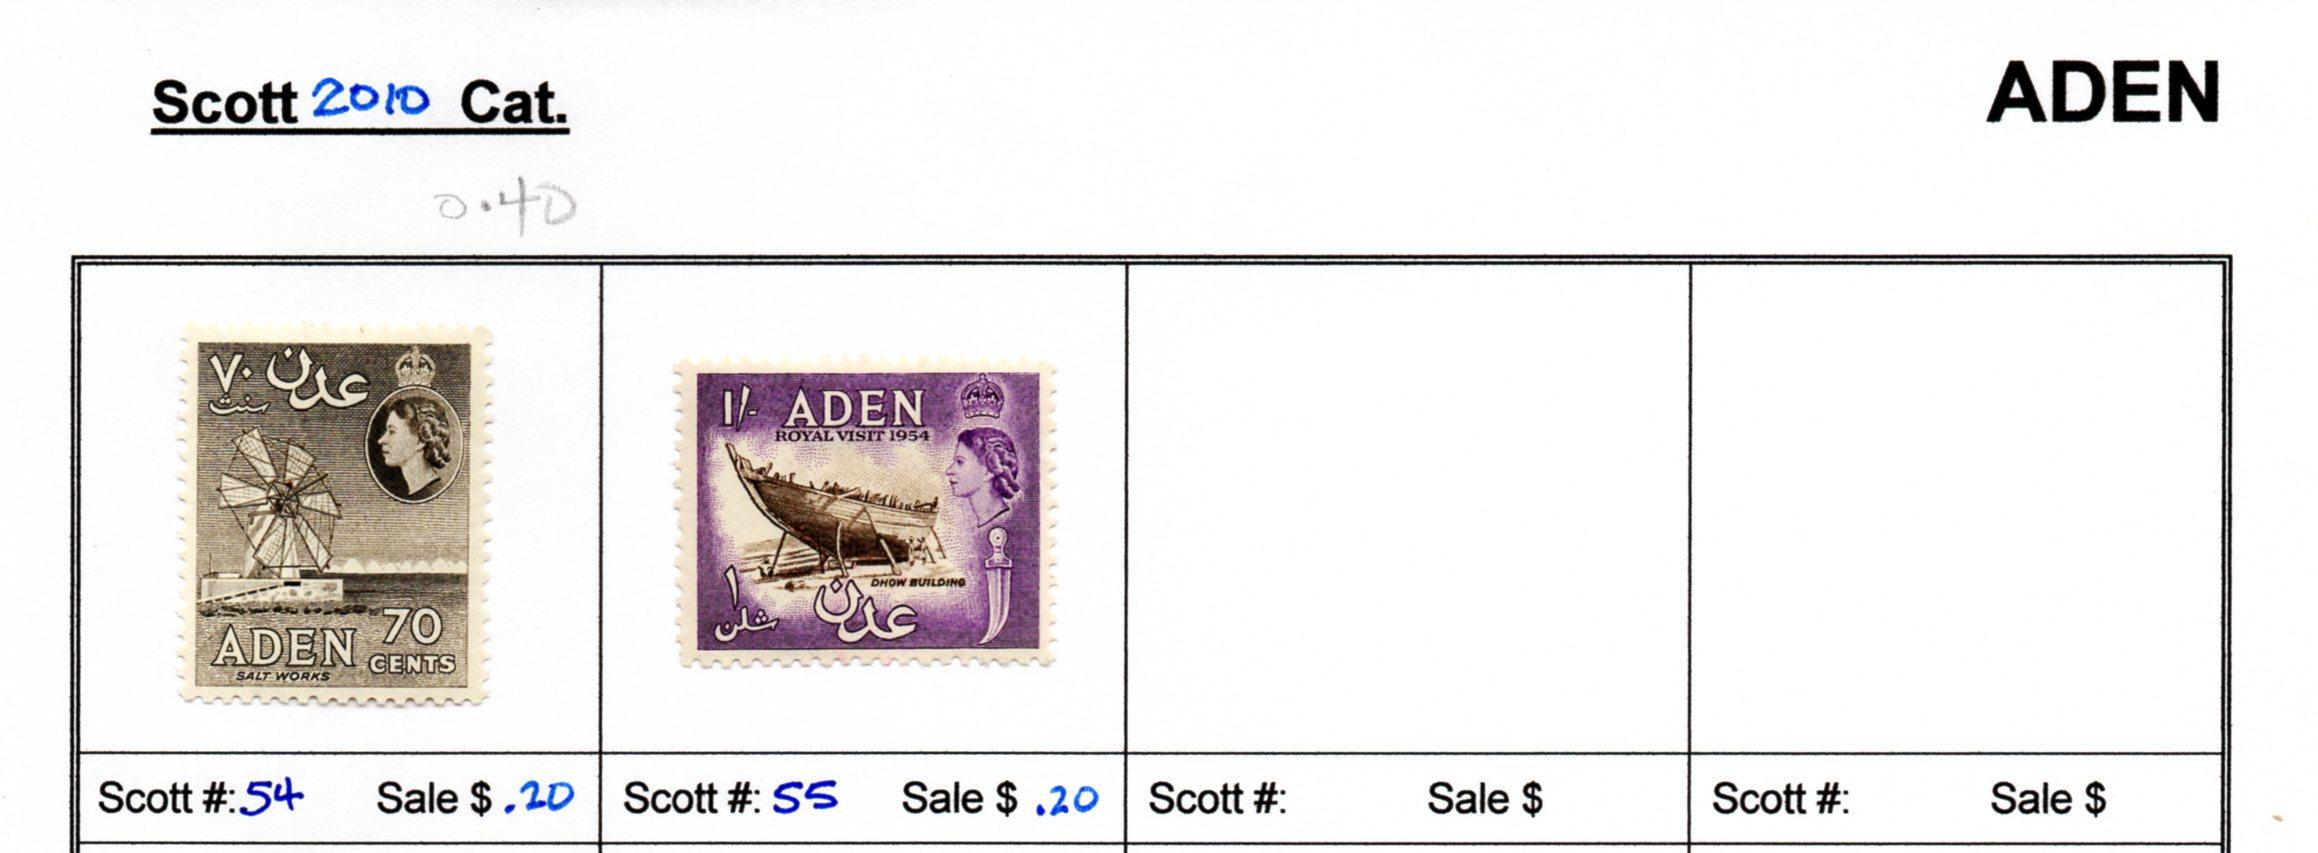 http://www.stamporator.com/images/Aden-001.jpg